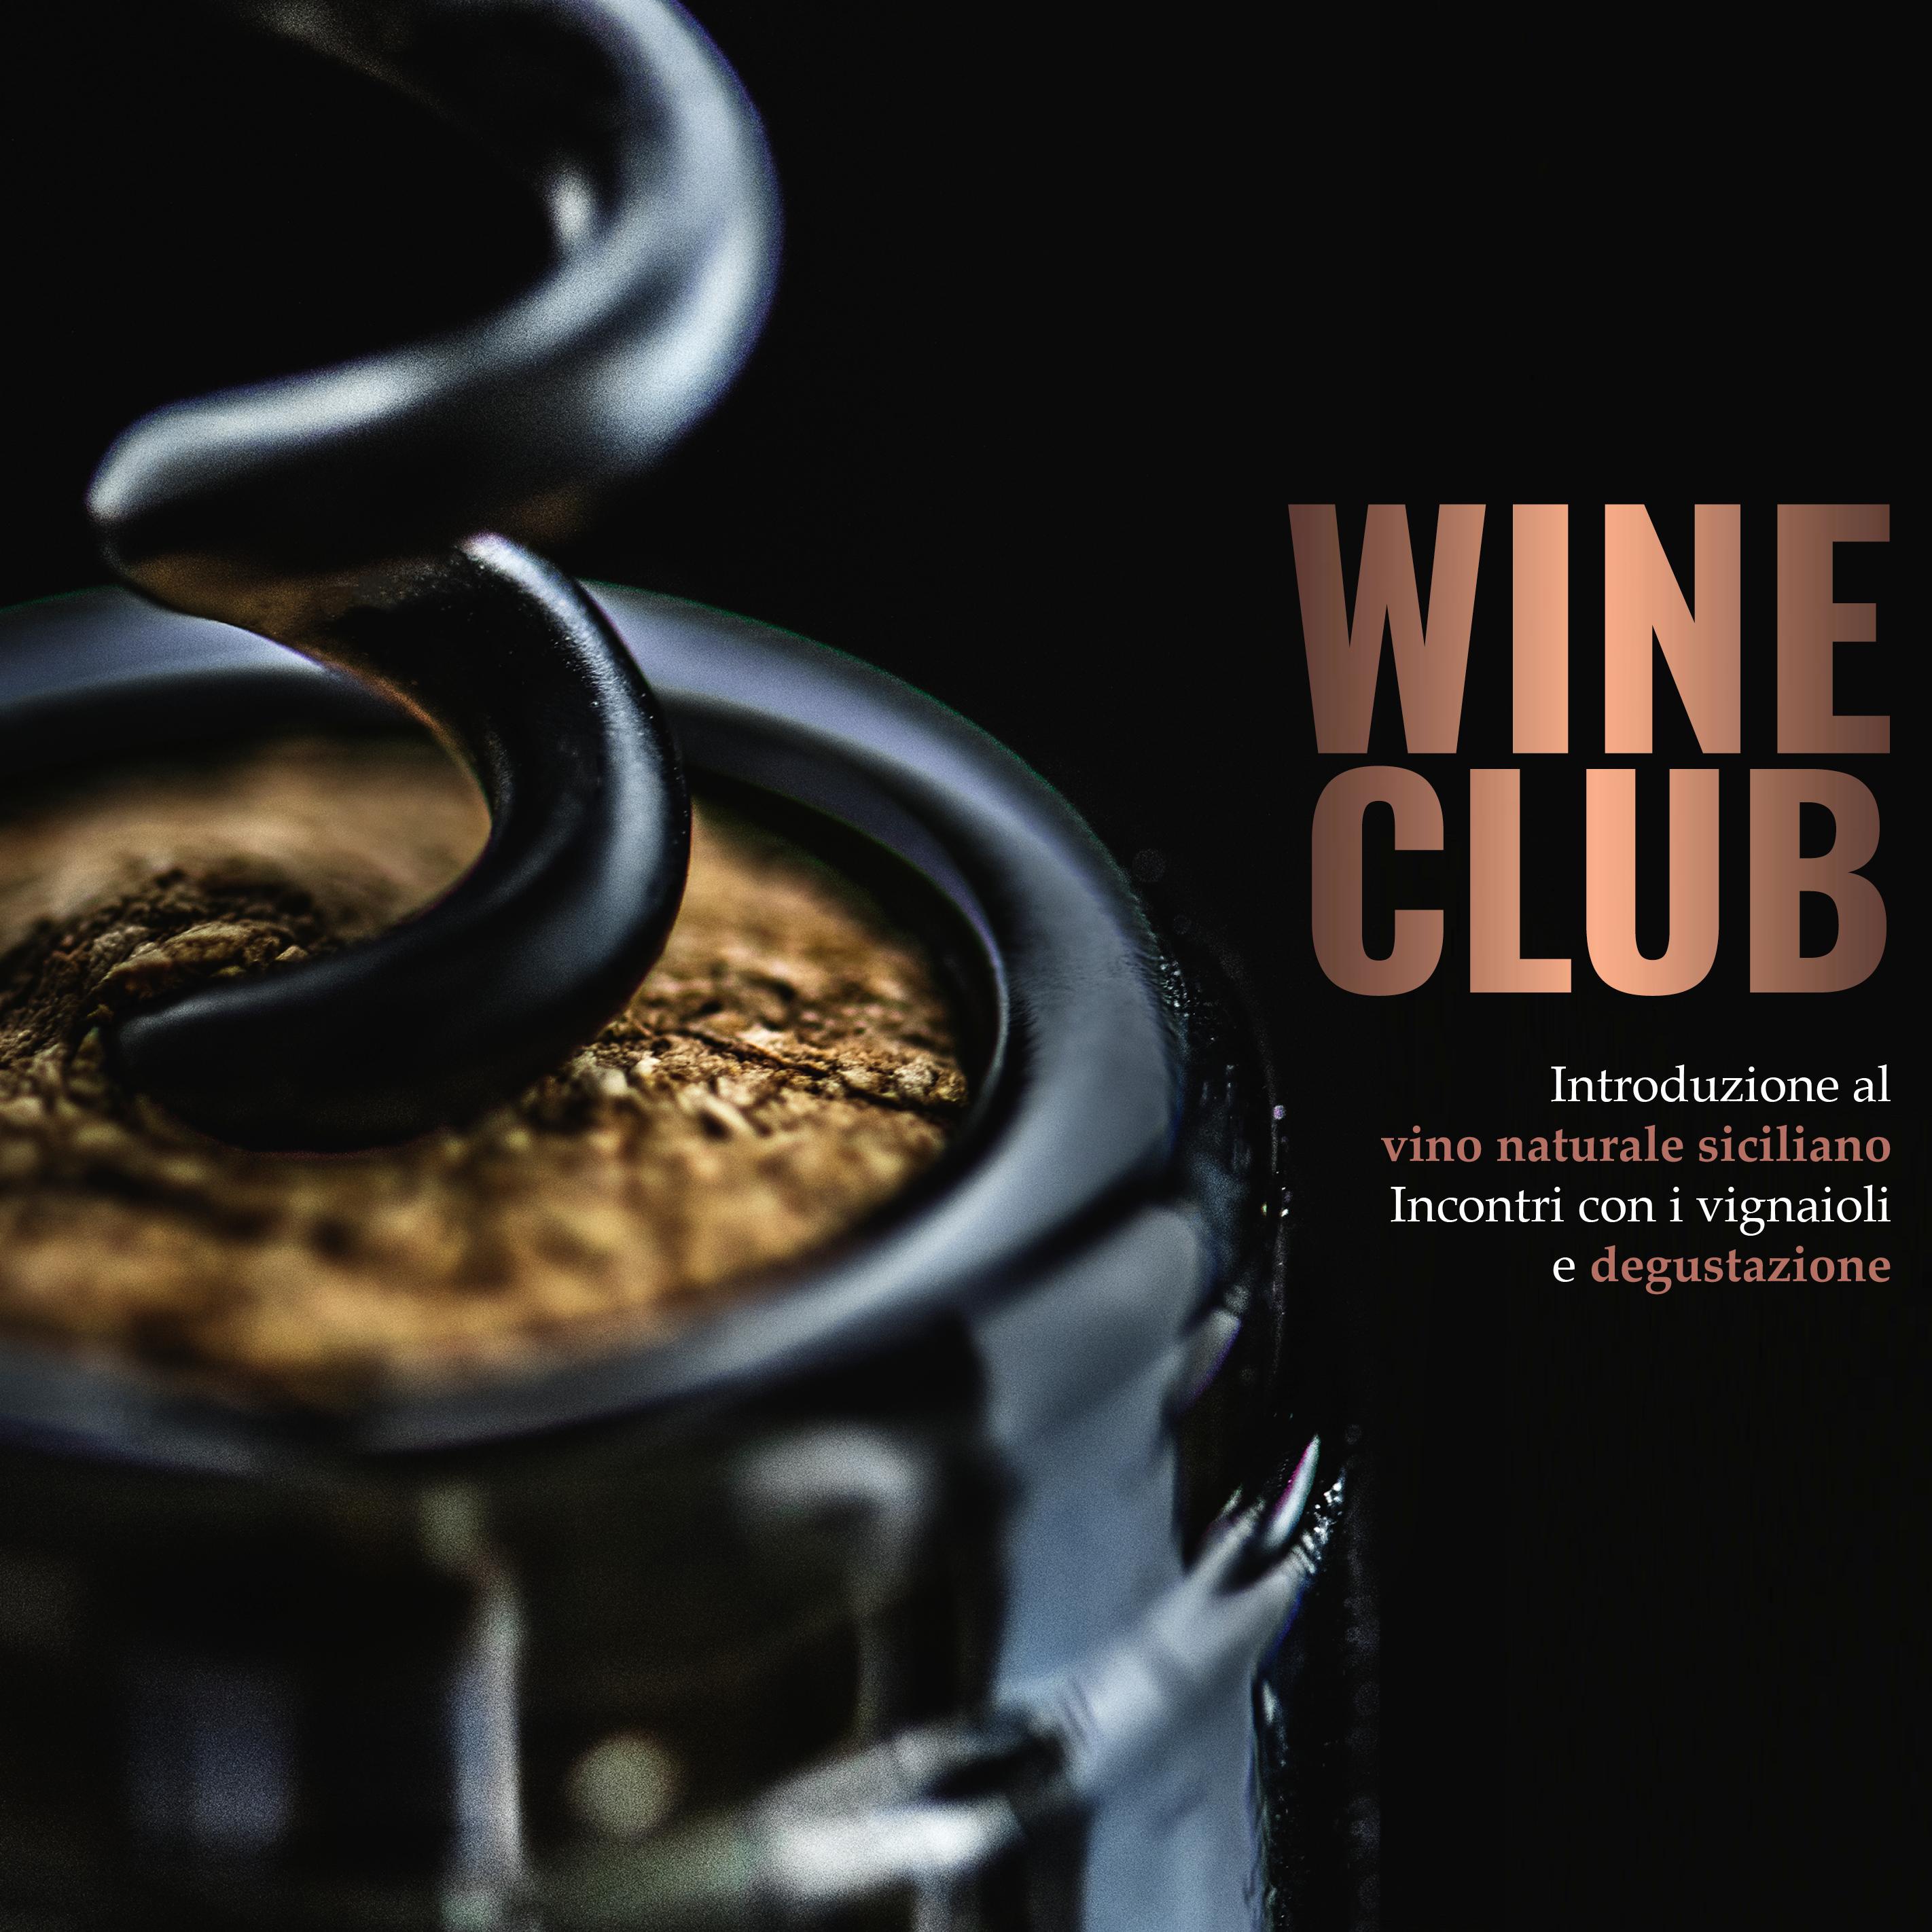 Wine Club: Introduzione Al Vino Naturale